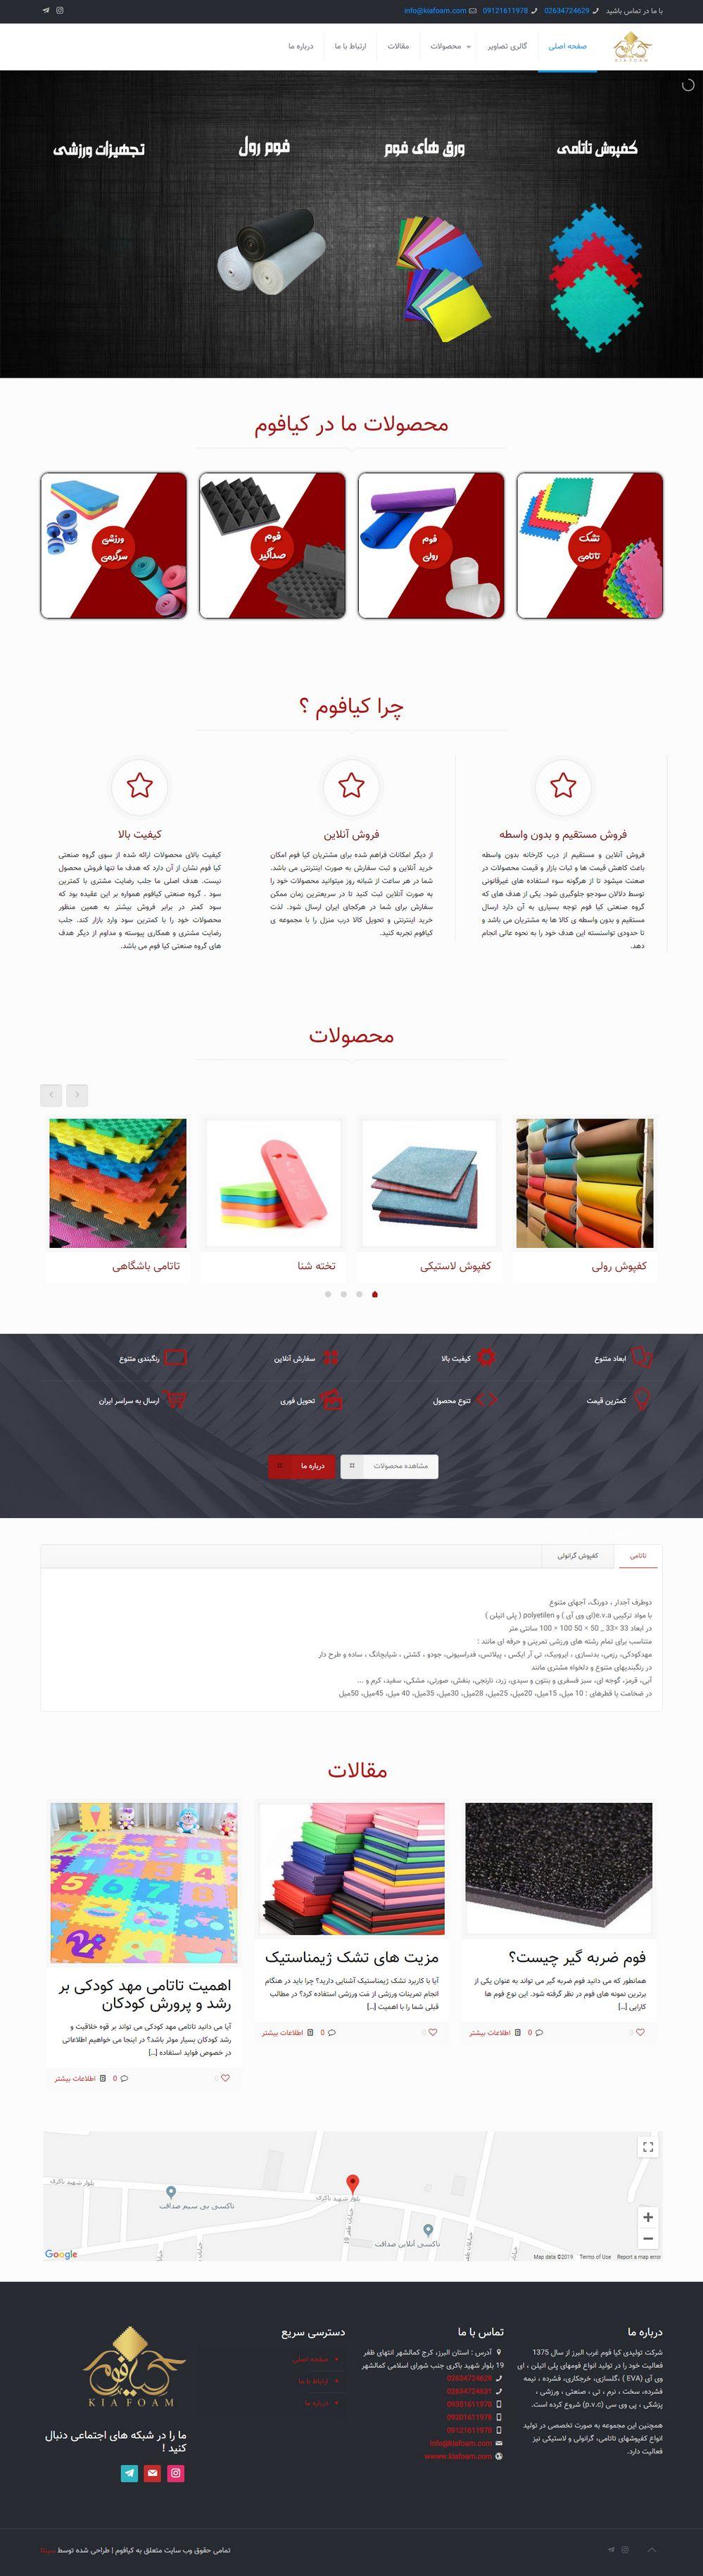 طراحی سایت کیافوم